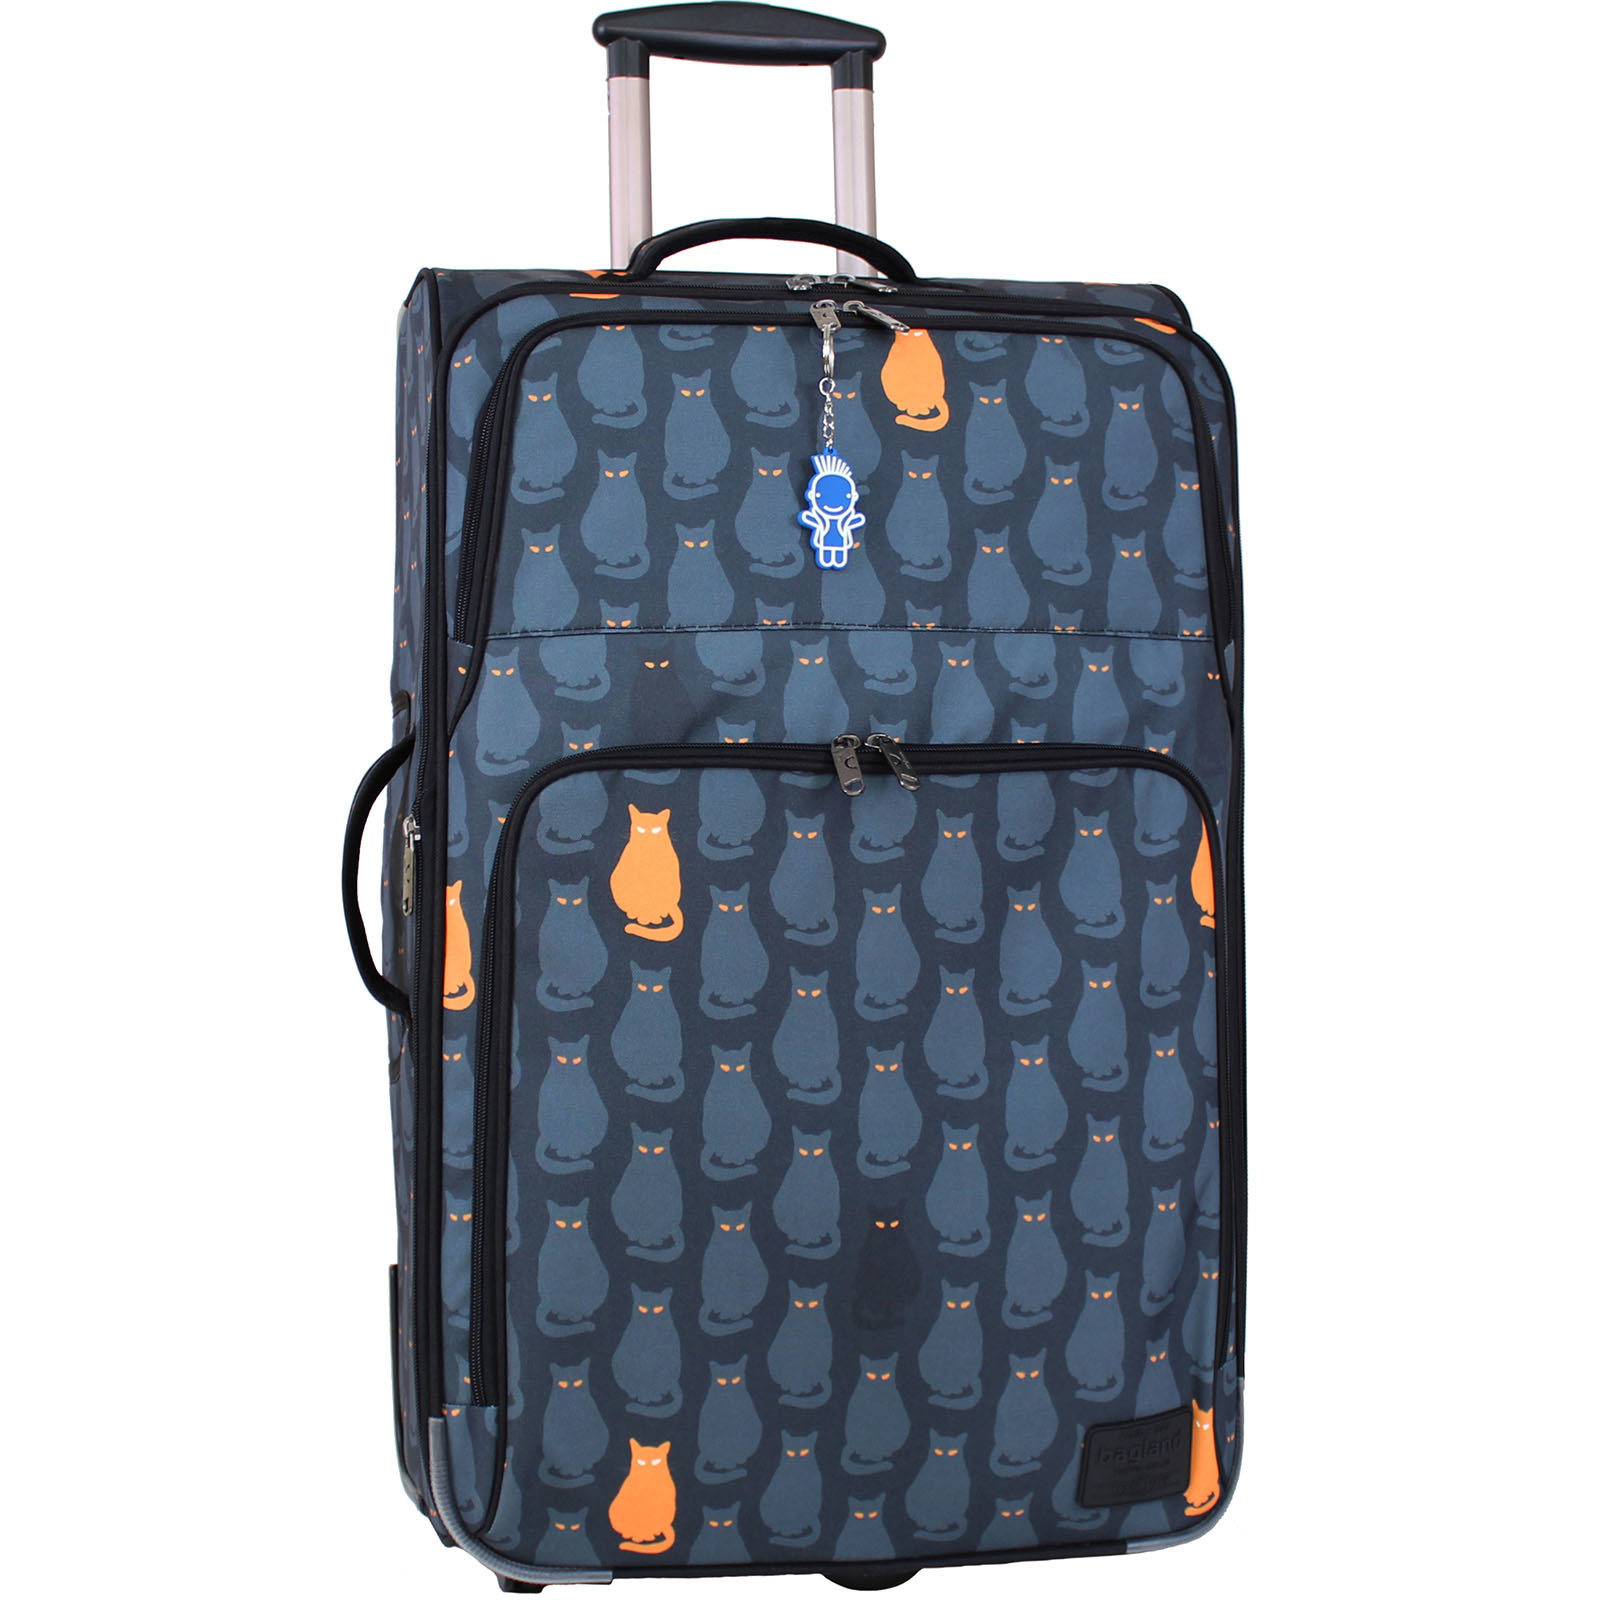 Дорожные чемоданы Чемодан Bagland Леон большой дизайн 70 л. сублімація 193 (0037666274) IMG_9807.JPG